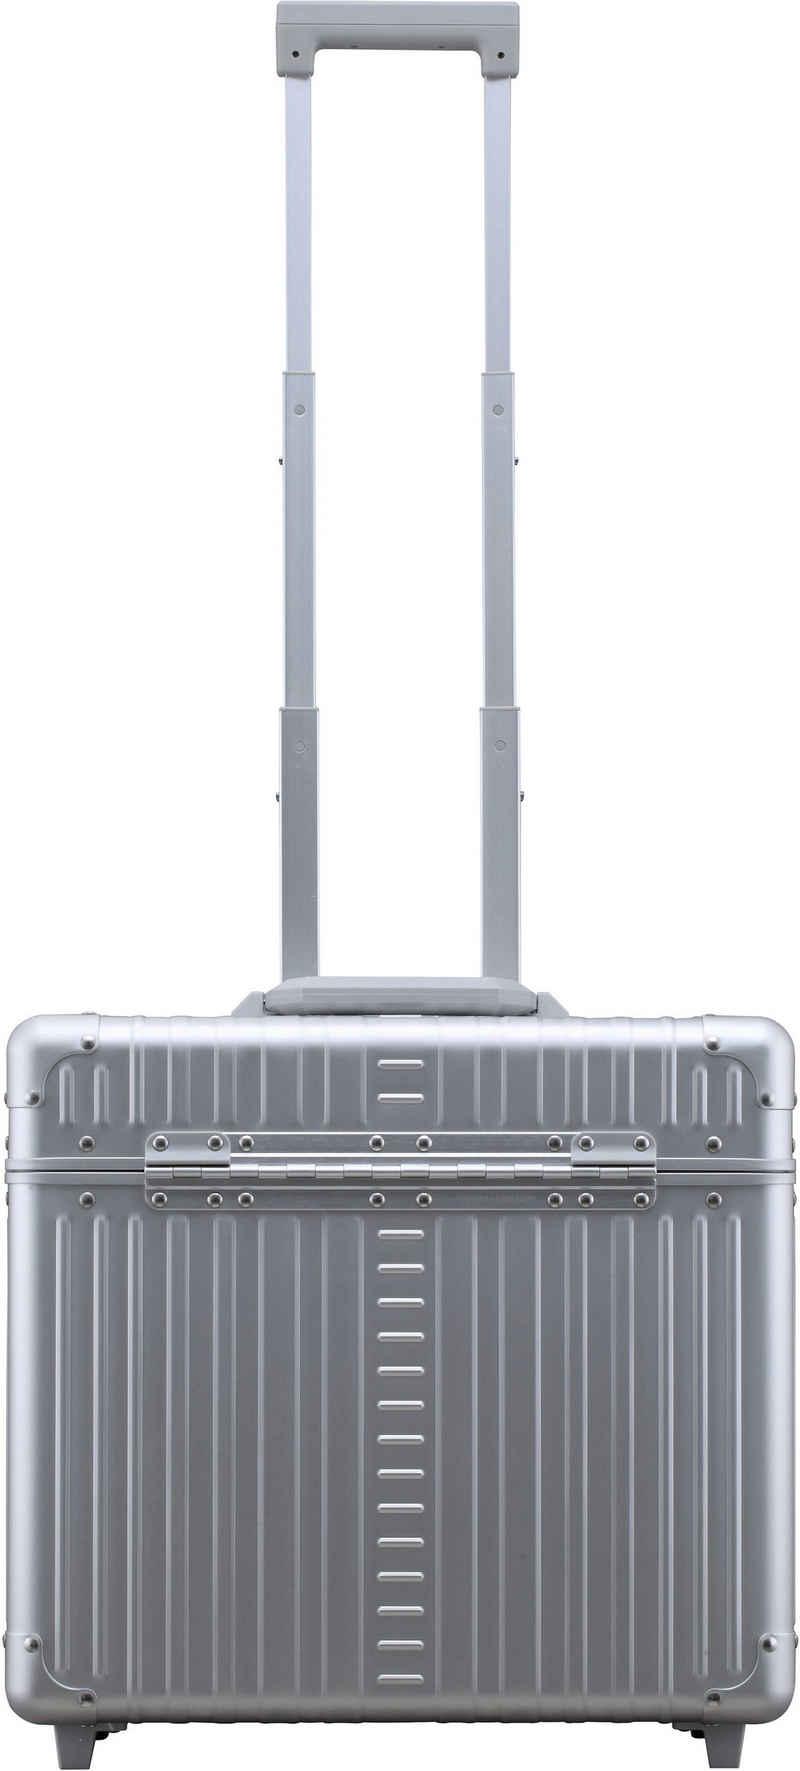 ALEON Pilotenkoffer »Aluminiumkoffer 17 Zoll Pilot Case, 42 cm«, 2 Rollen, inkl. Kabeltasche und Schutzhülle